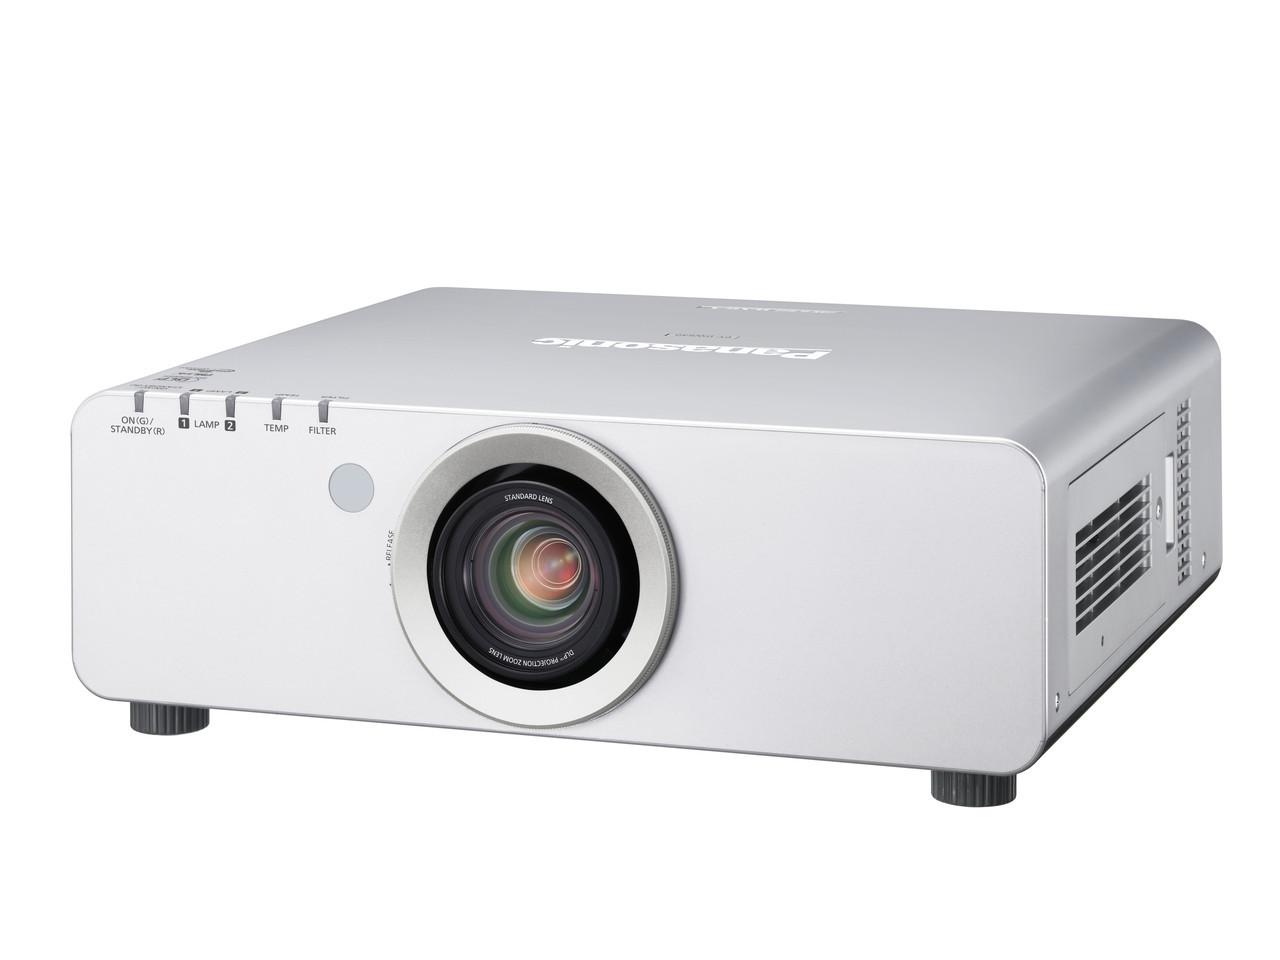 Проектор Panasonic PT-DW640EK, PT-DW640ES, PT-DW640ELK,PT-DW640ELS